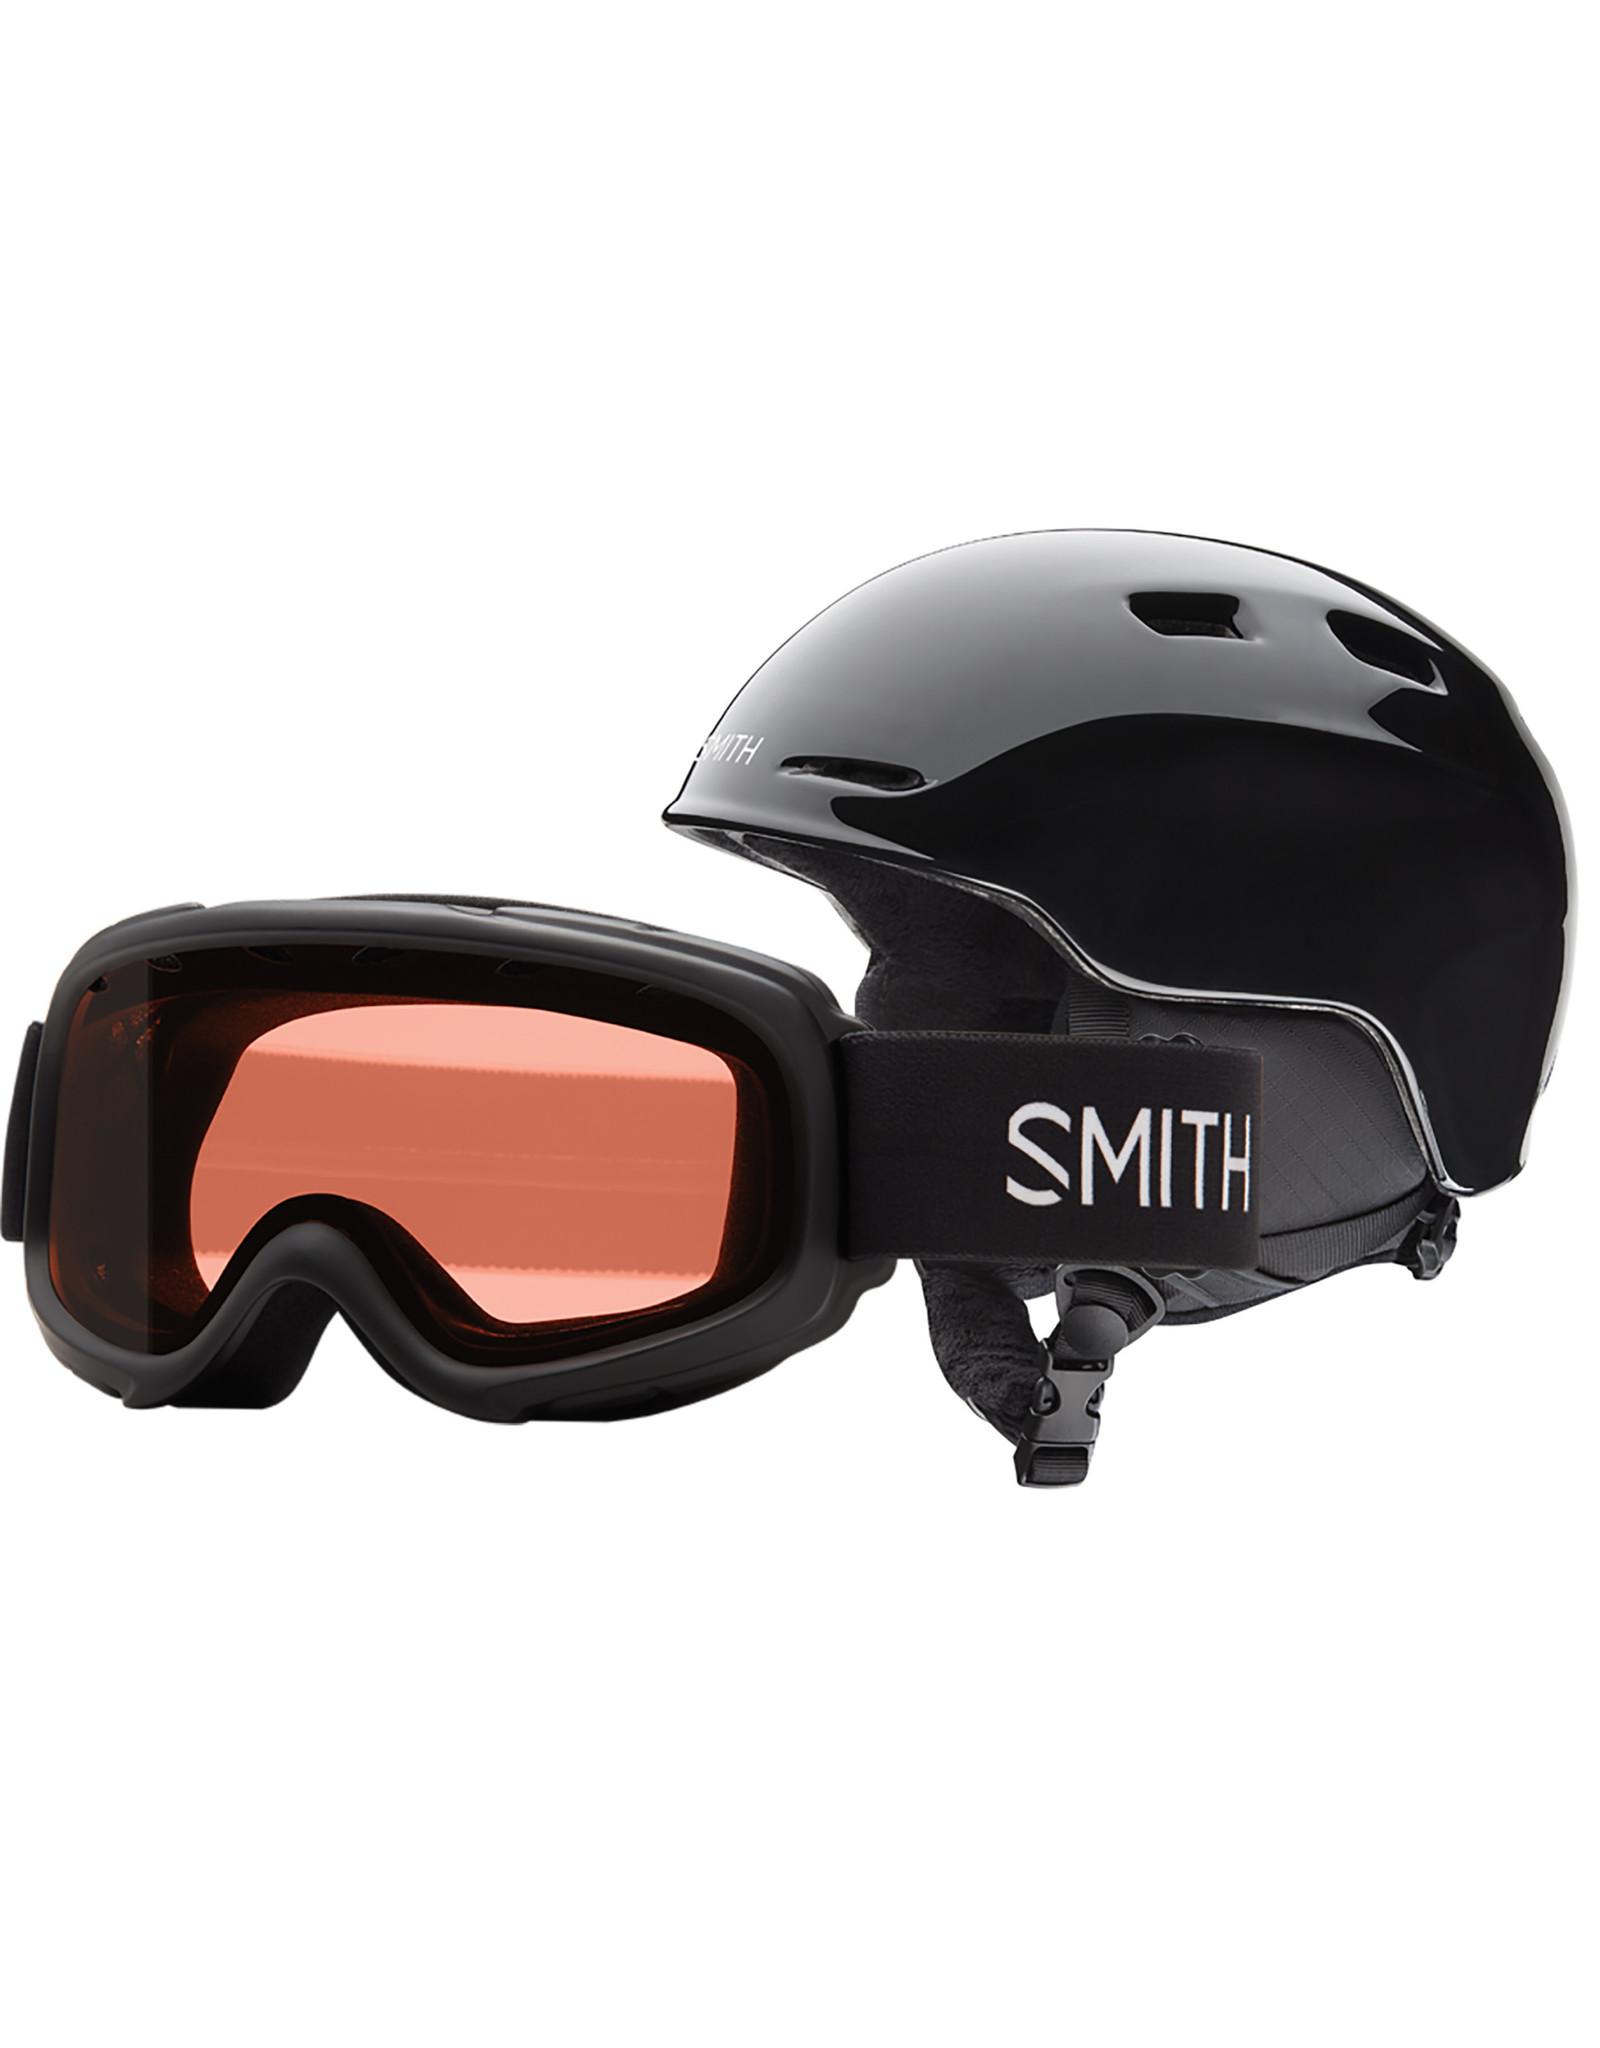 Smith SMITH ZOOM JR GAMBLER COMBO BLACK 20 LUNETTE & CASQUE